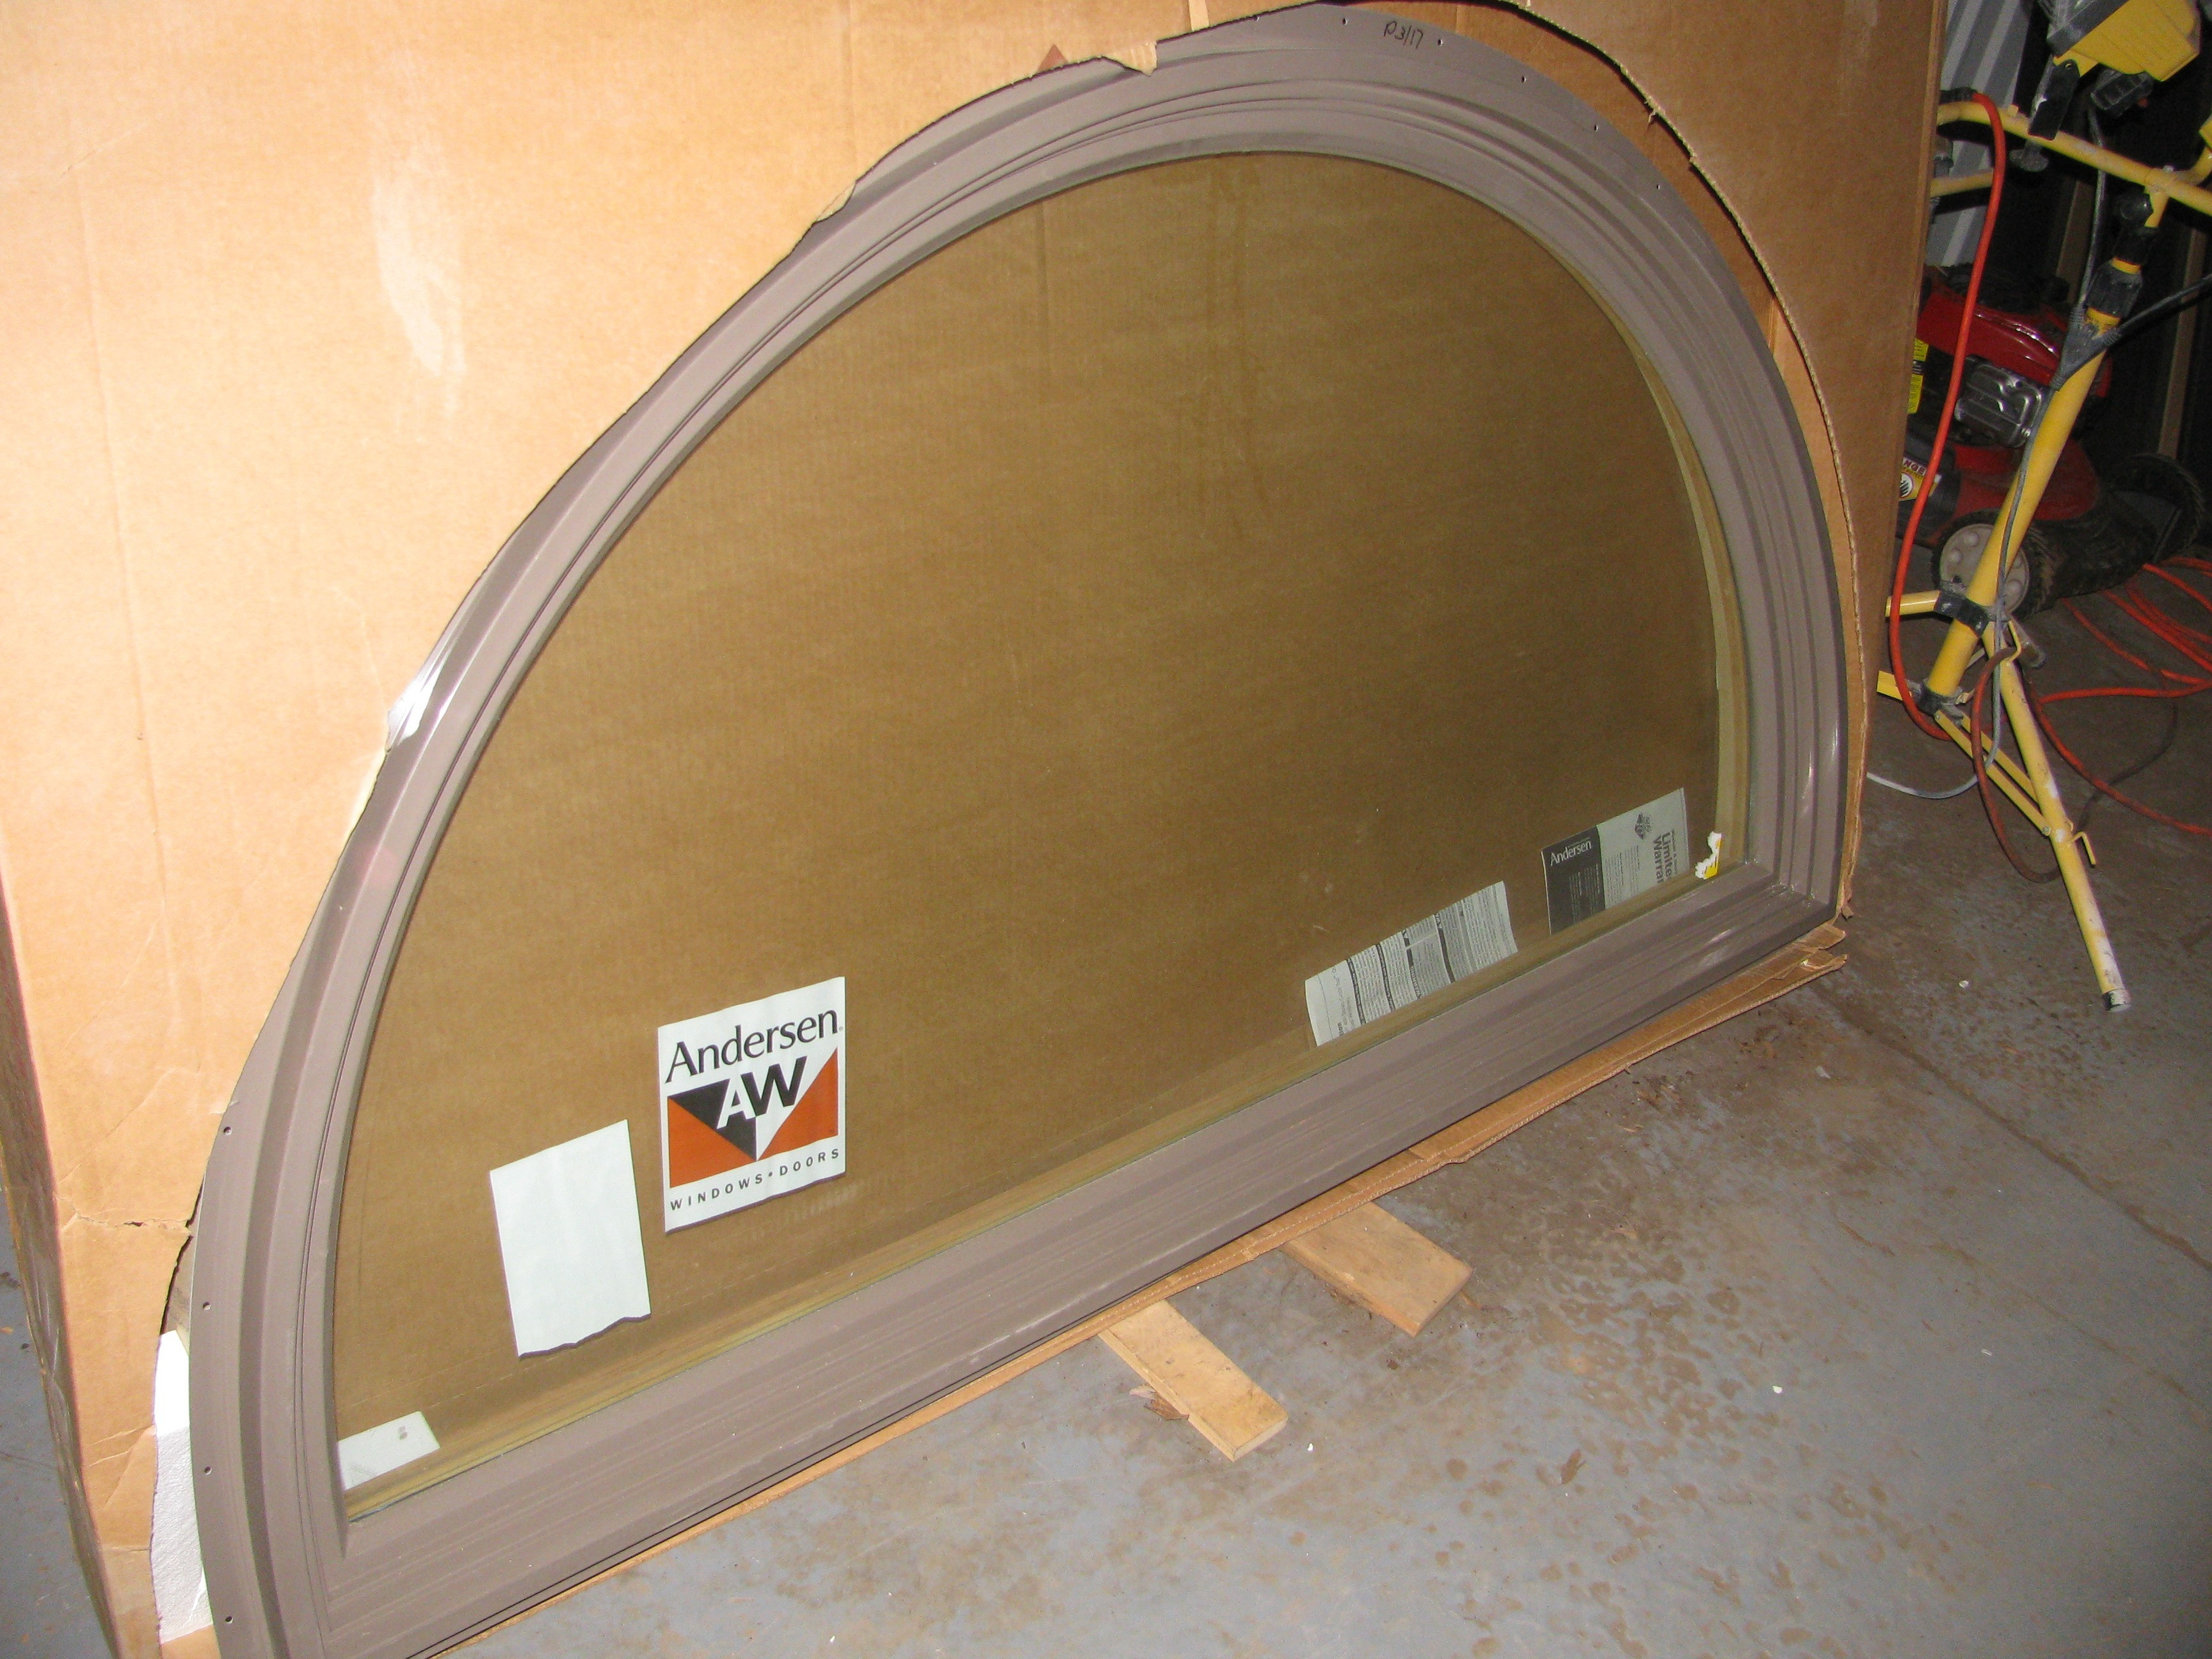 6 new andersen terratone half round 400 series windows for 12 round window